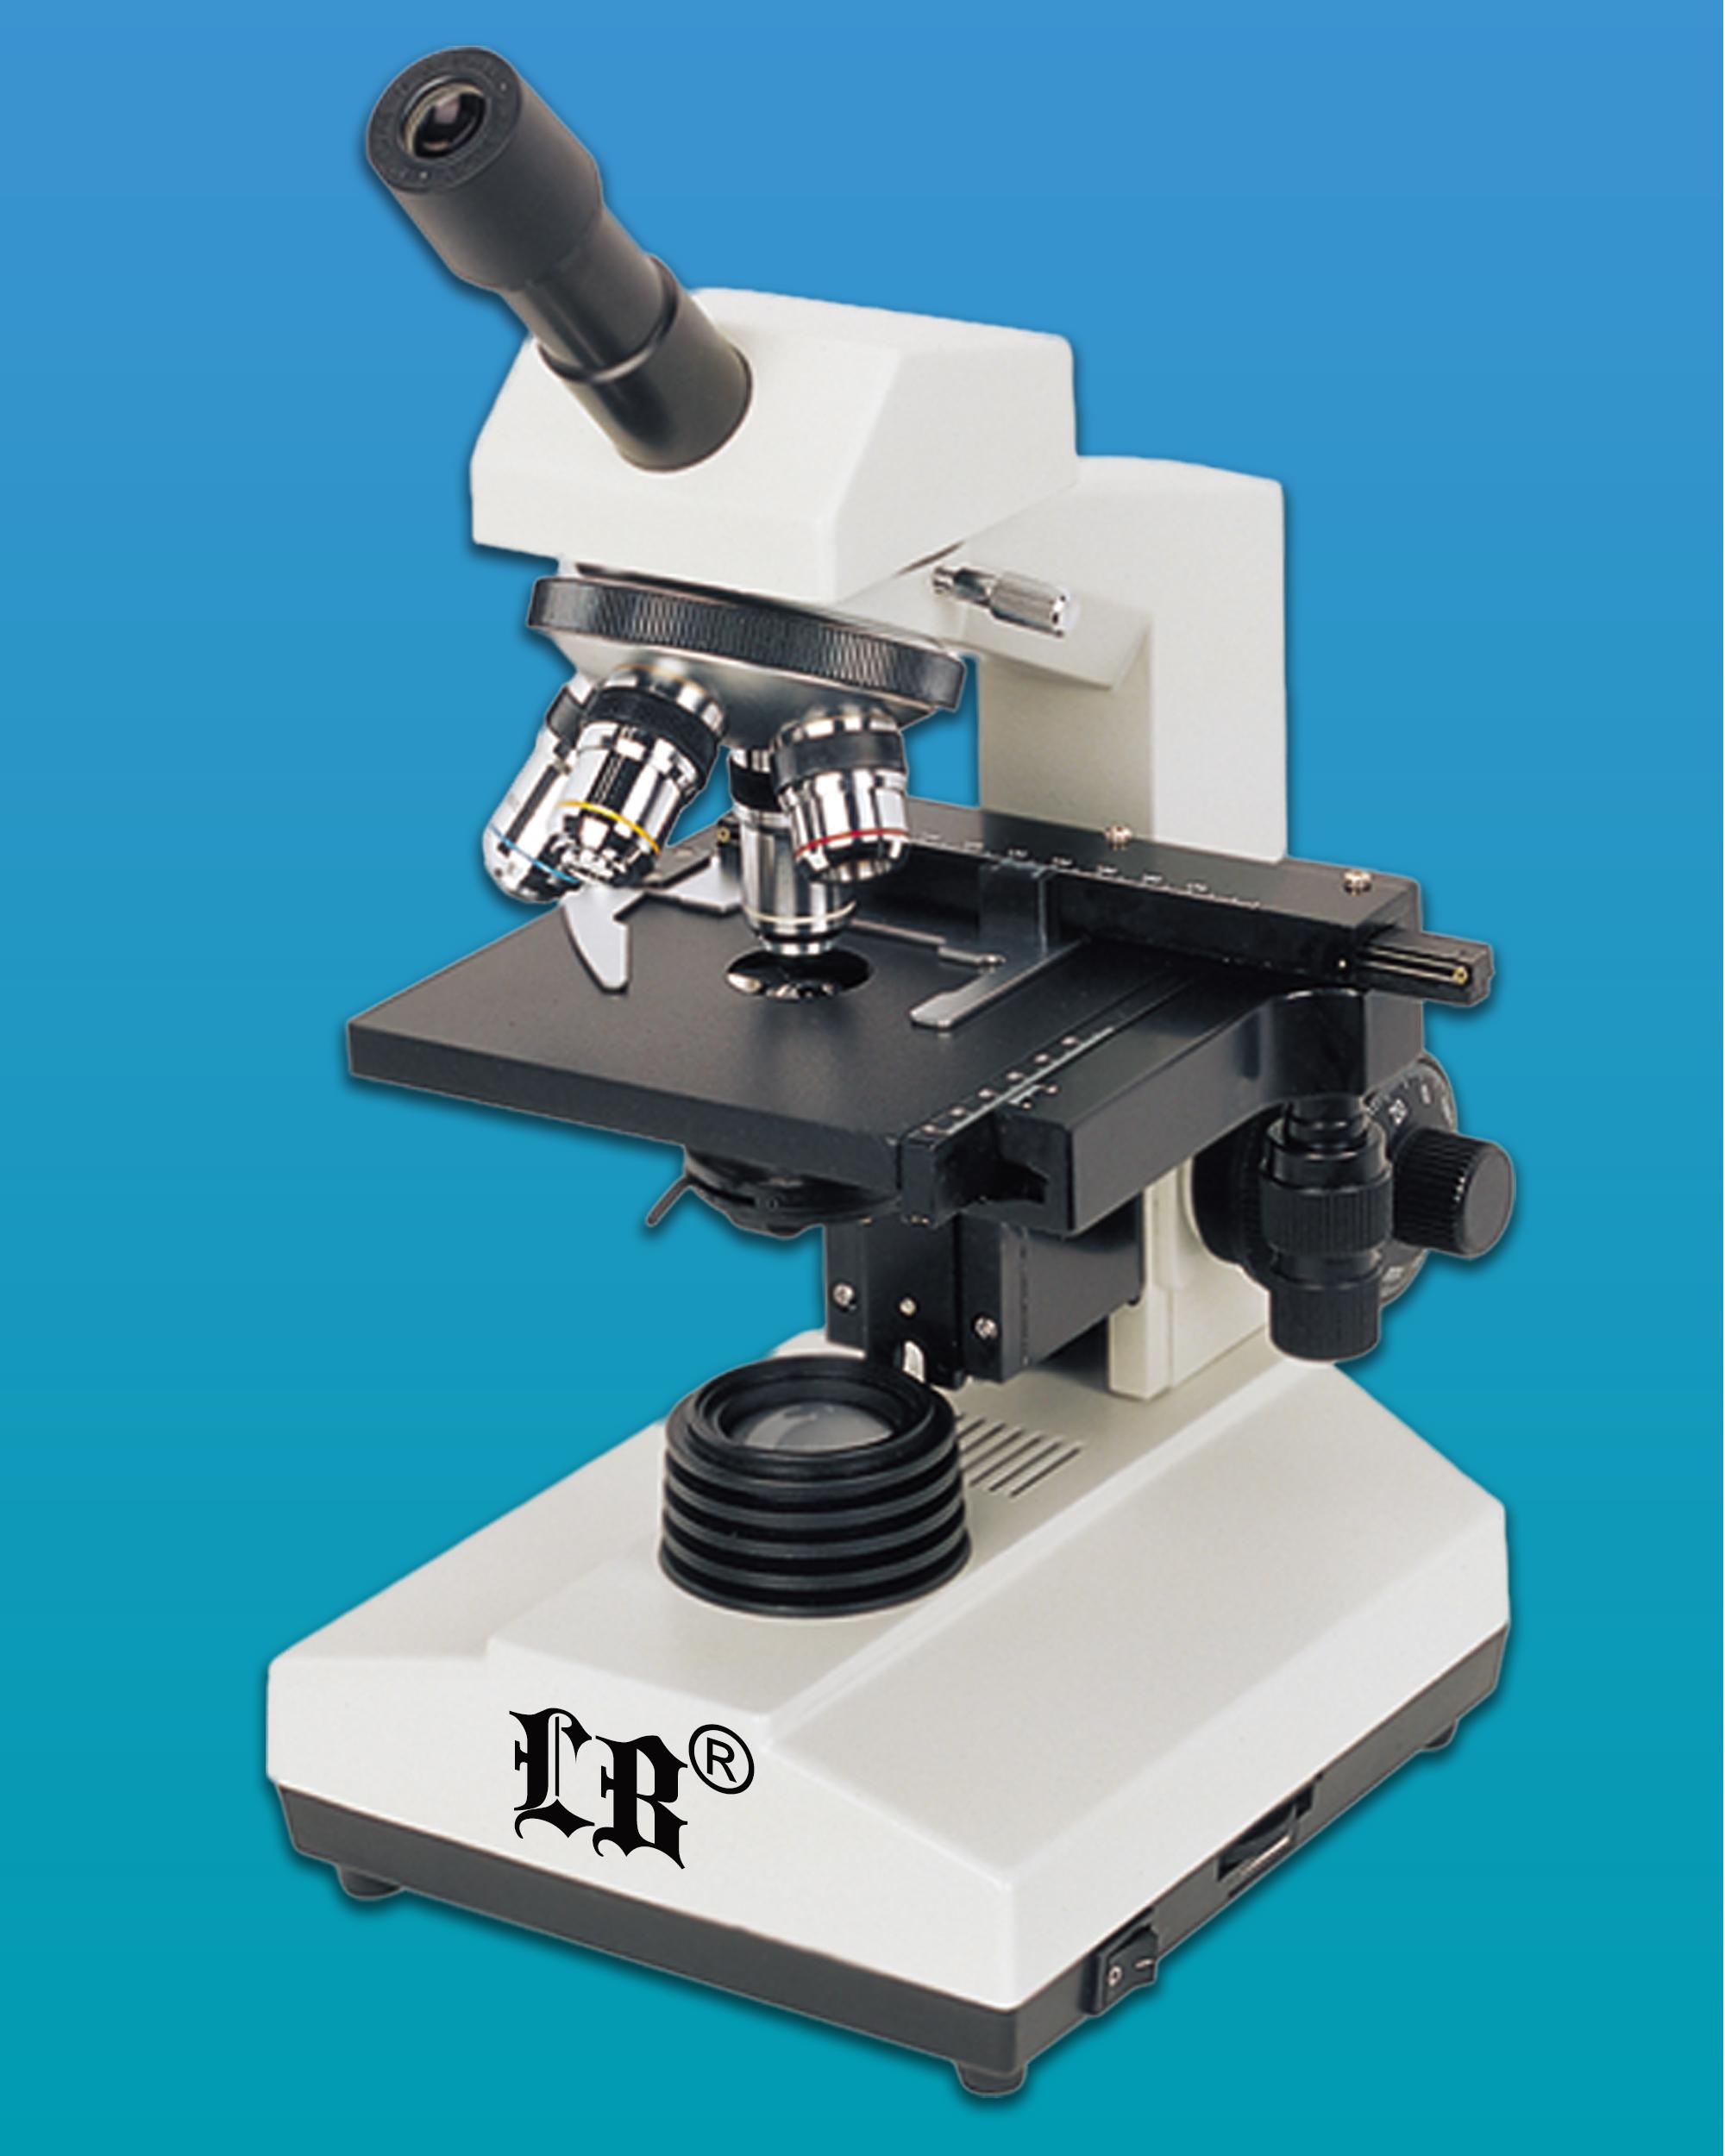 [LB-124] Monocular Biological Microscope